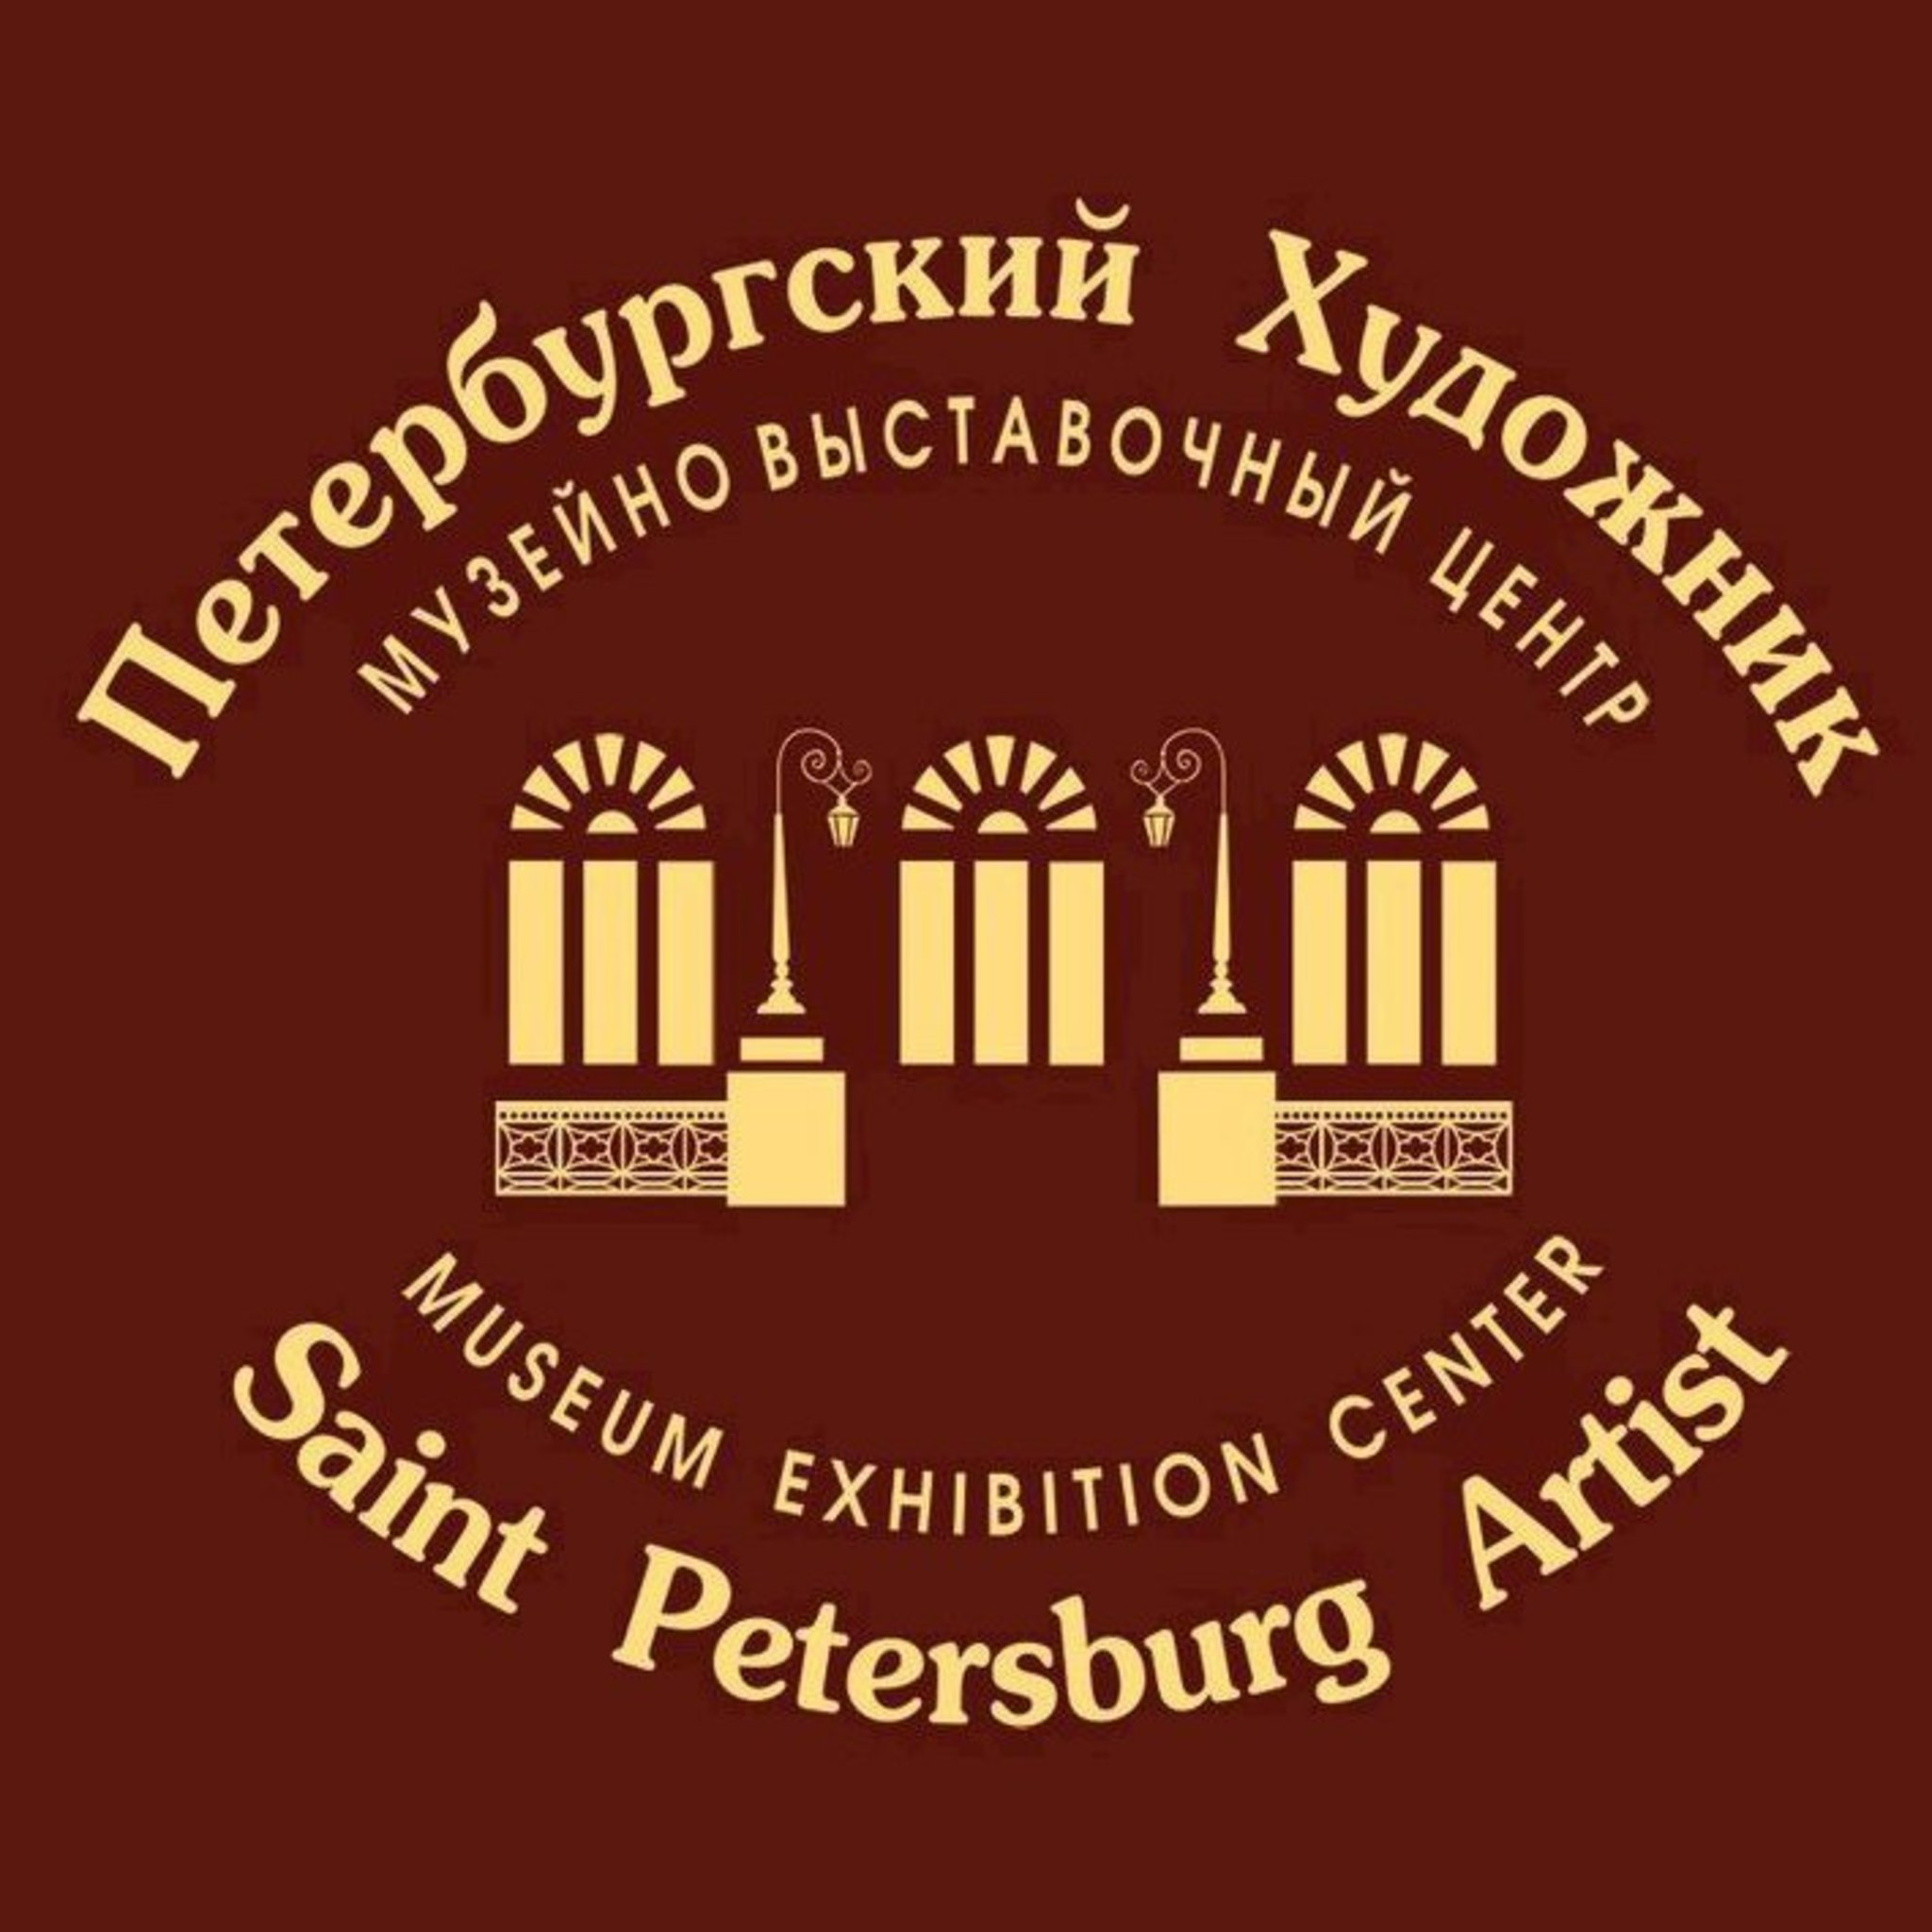 Museum-exhibition Center of the St. Petersburg Artist